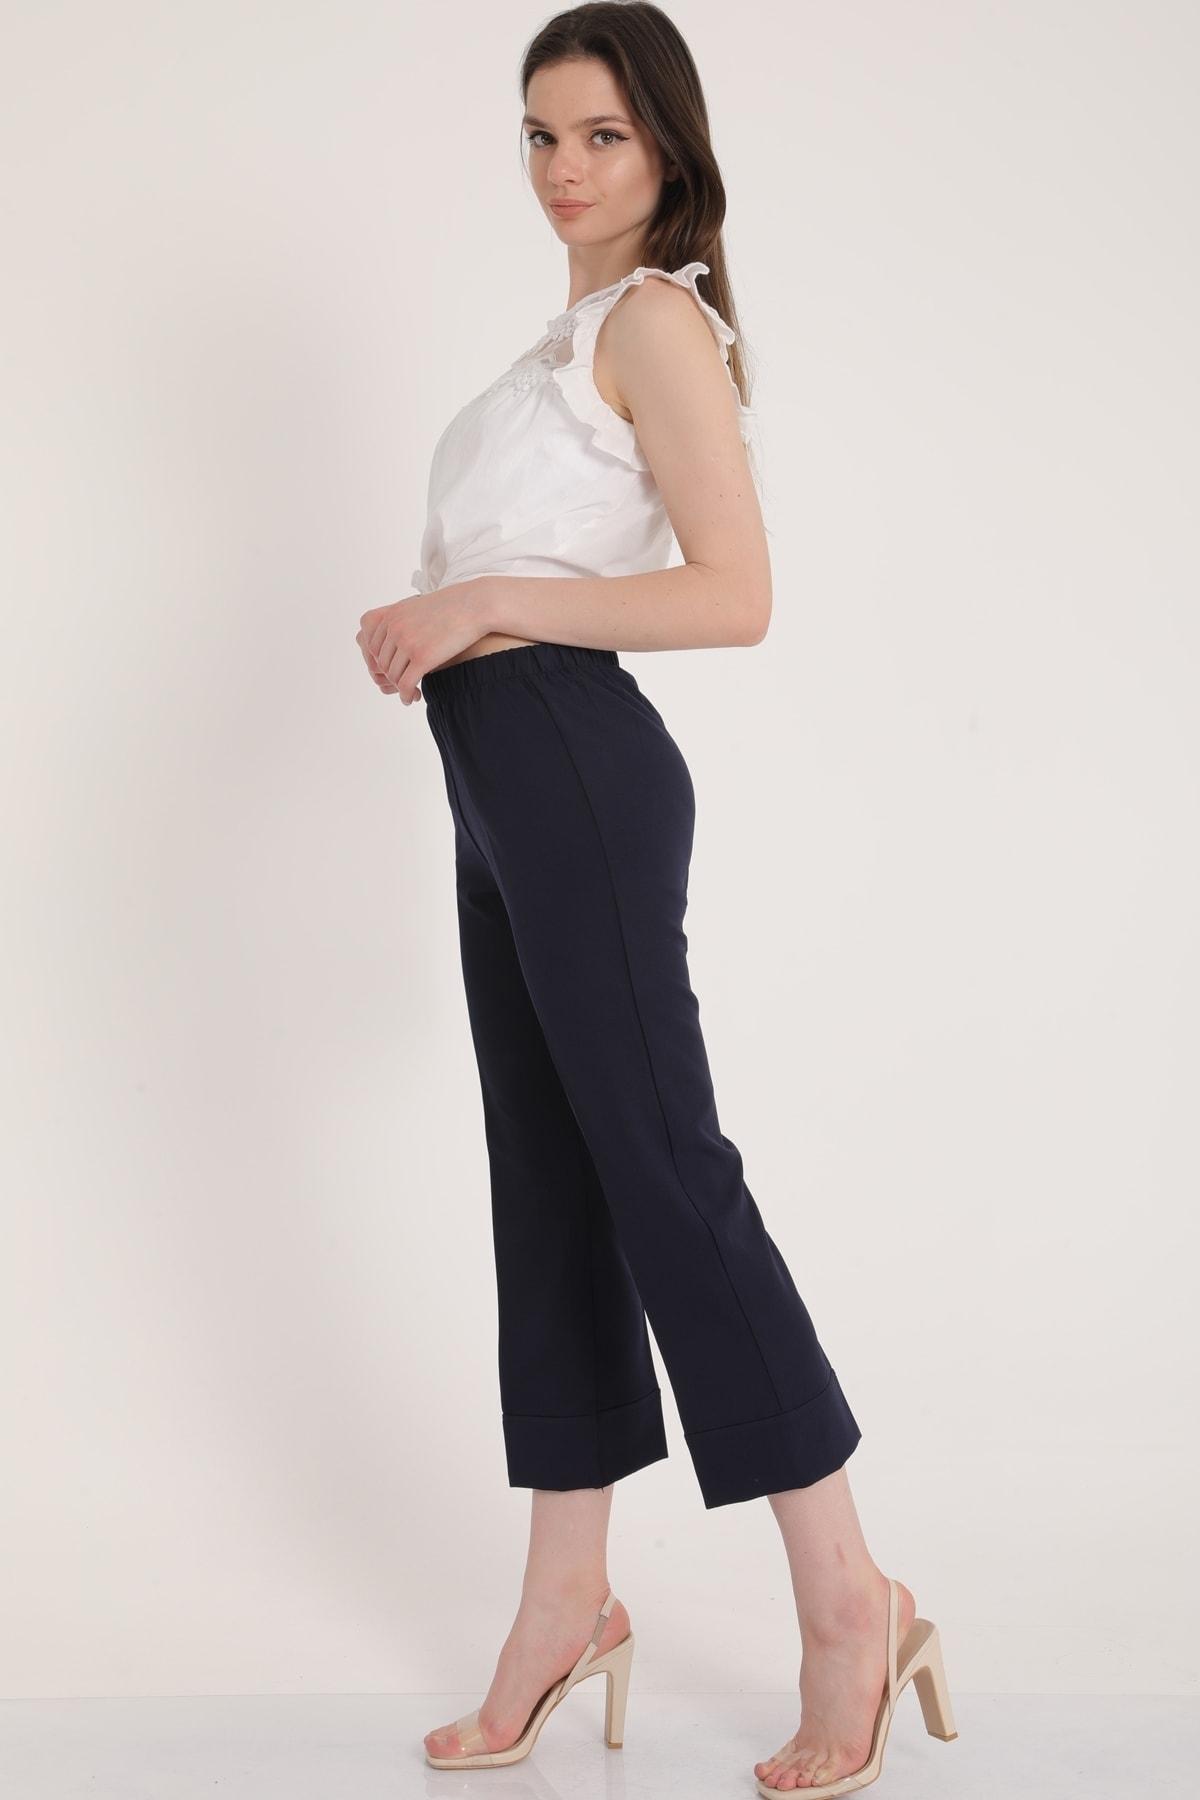 MD trend Kadın Lacivert Bel Lastikli Duble Paça Rahat Kumaş Pantolon Mdt5279 1